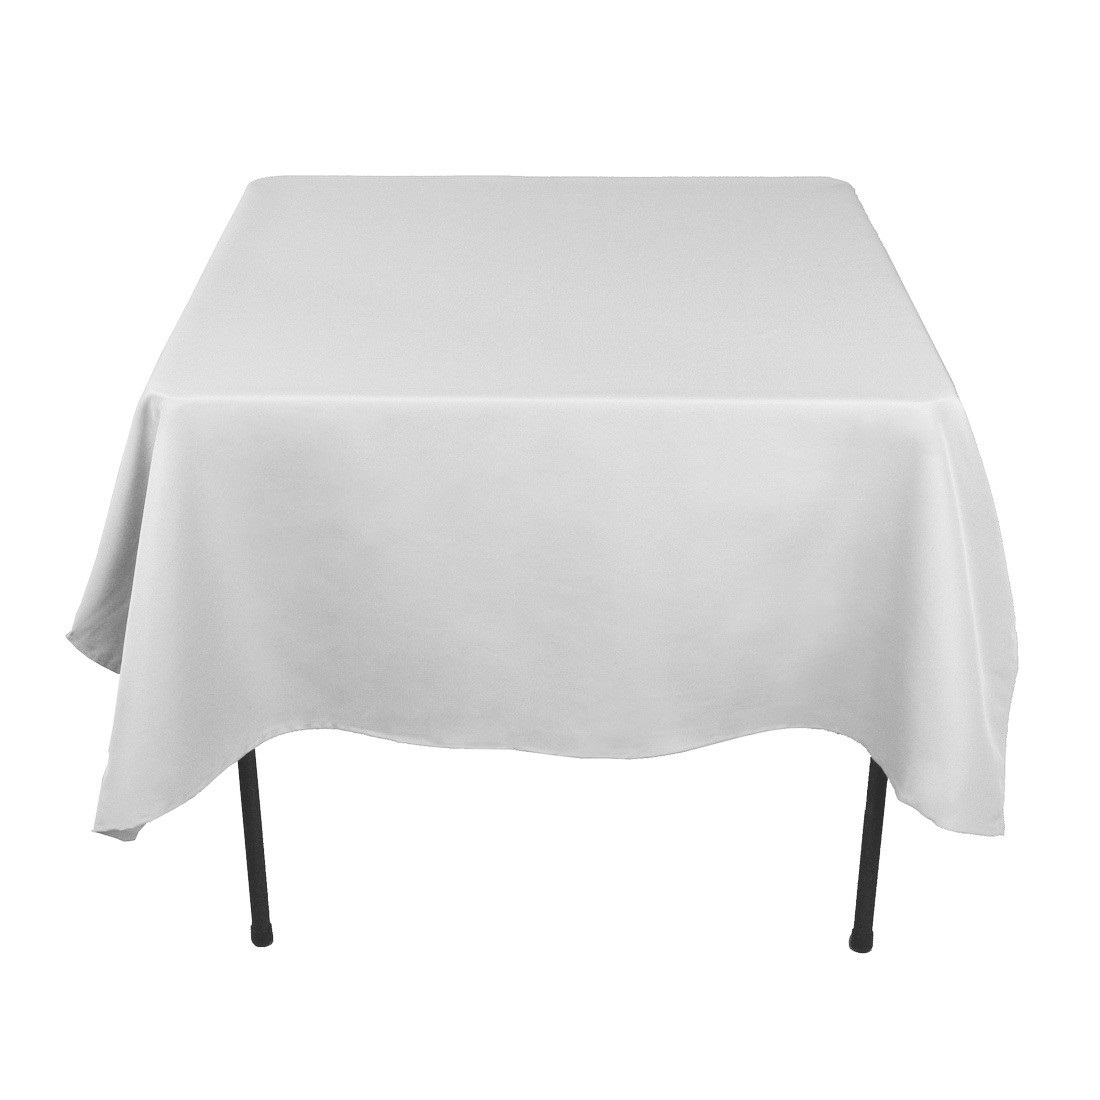 Tablecloths Square Harrisons Hiremaster Wanganui